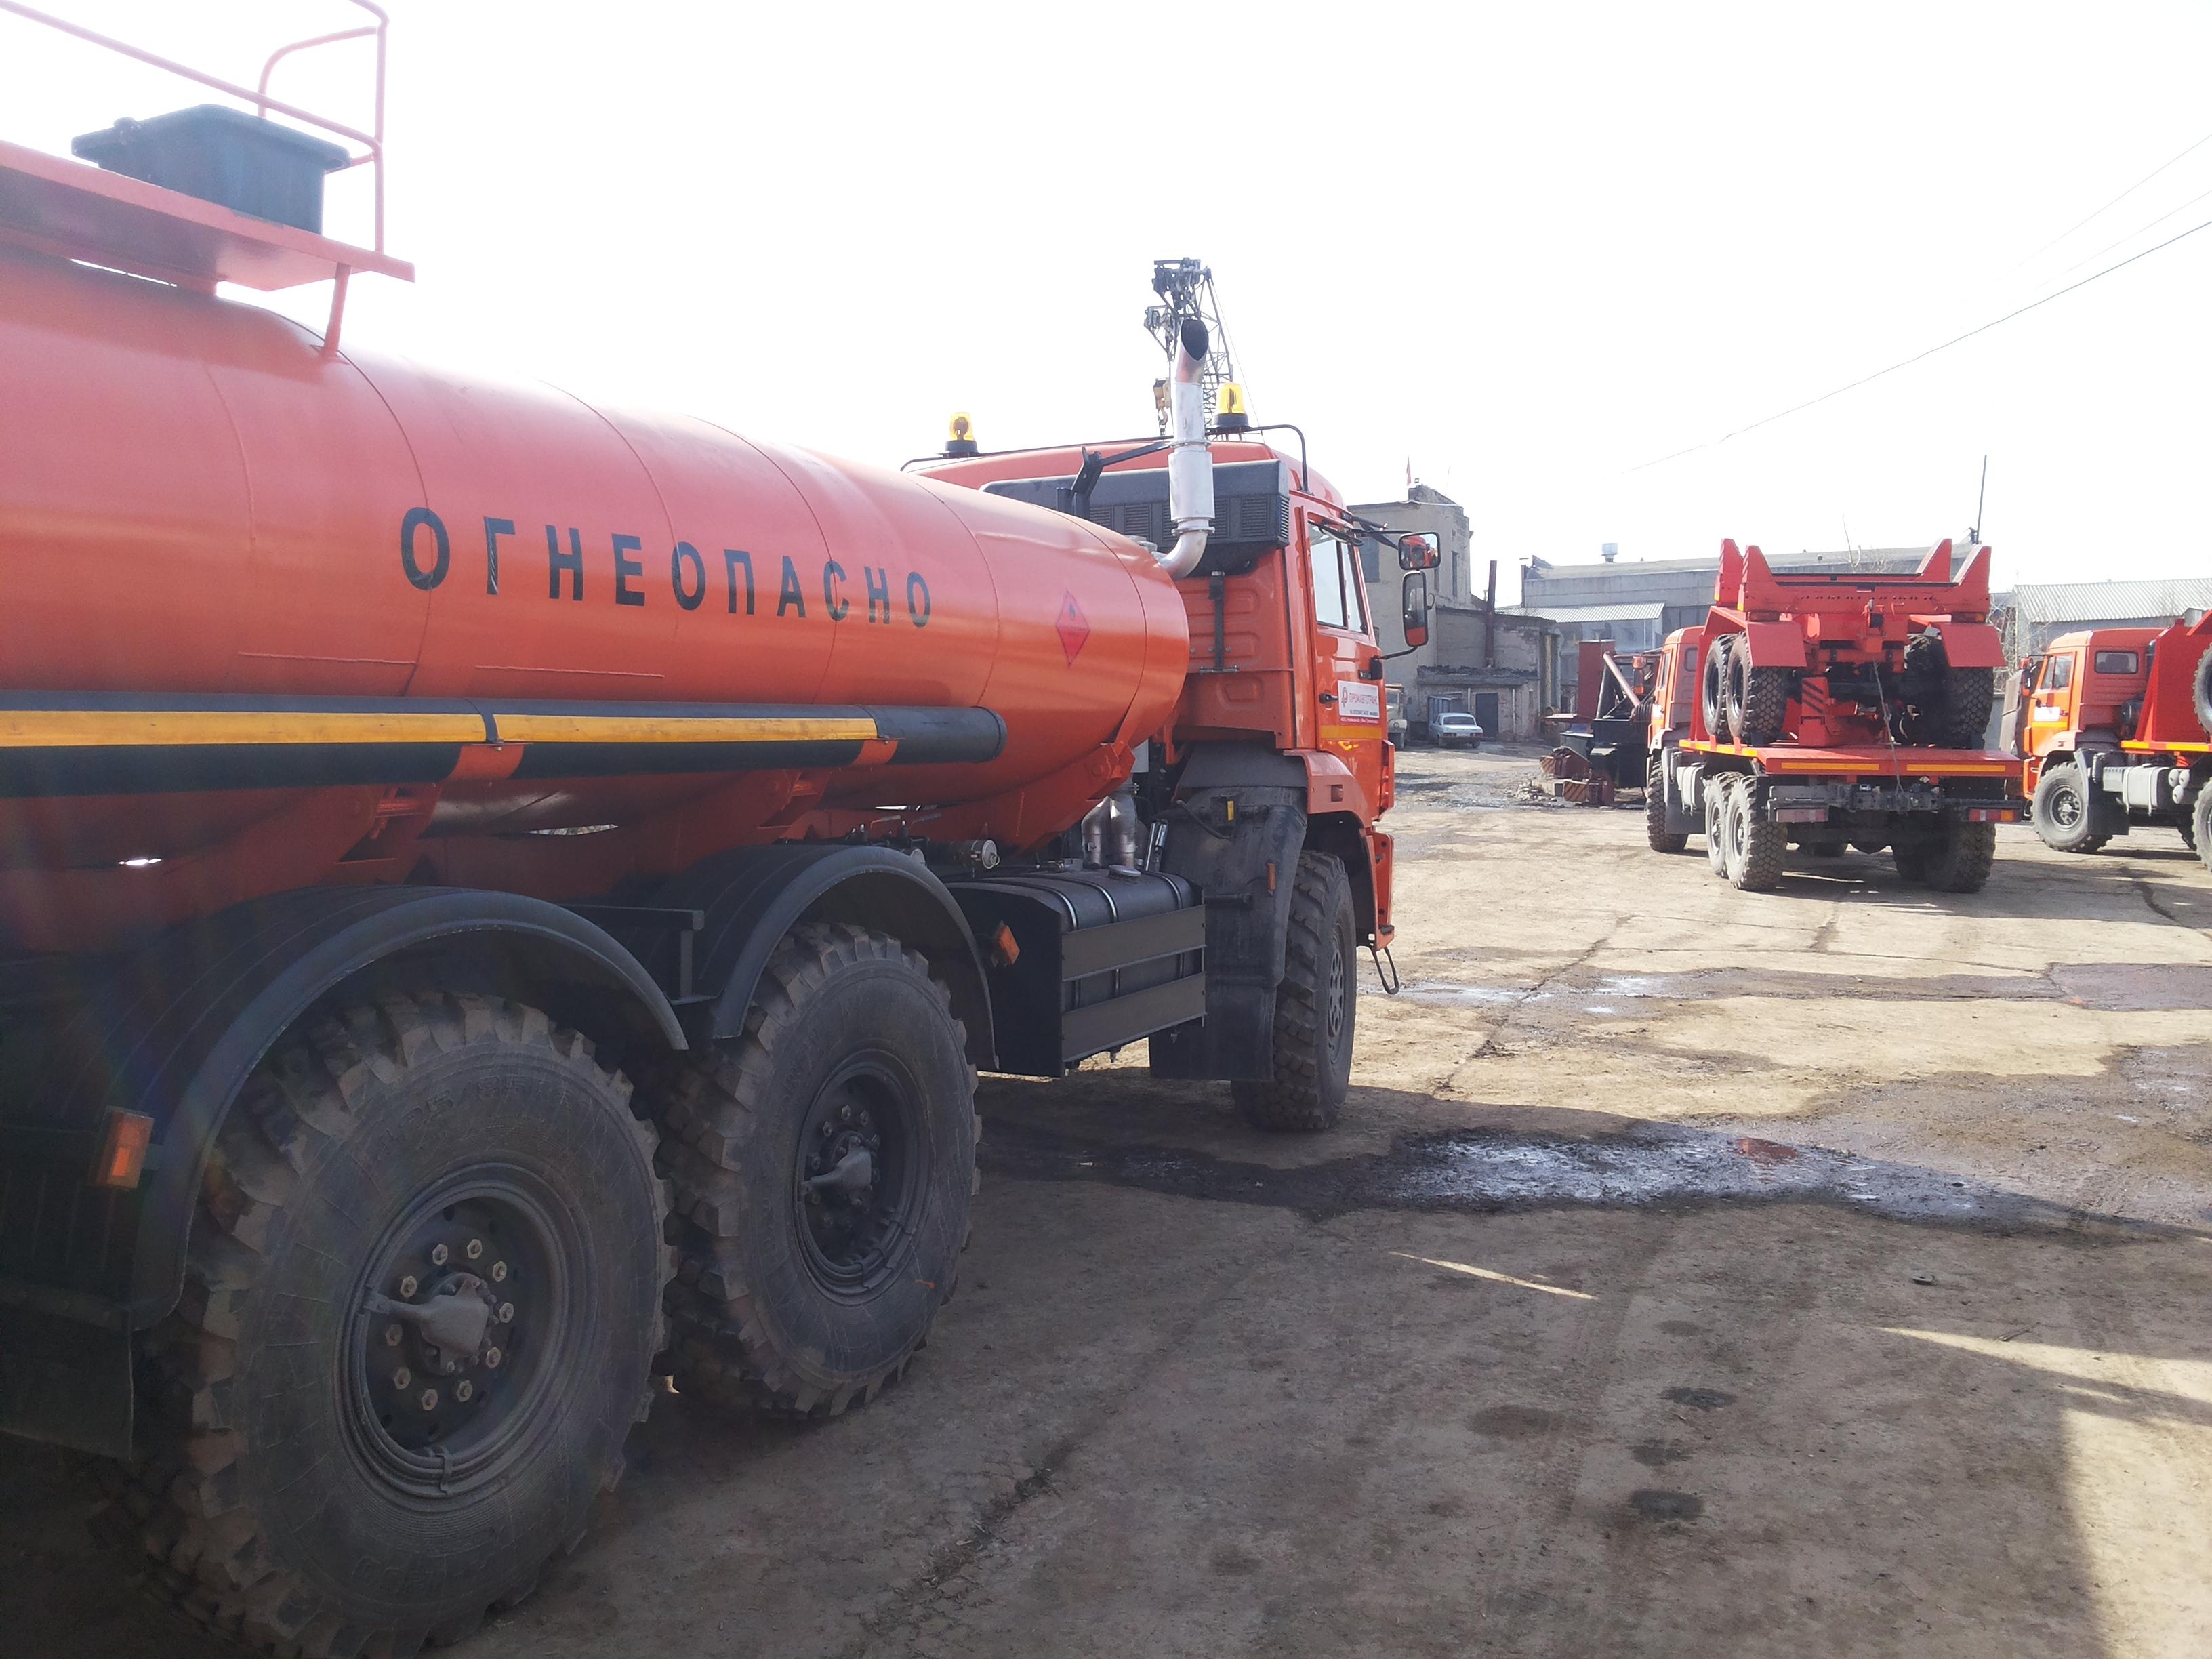 Автотопливозаправщик 10 куб.м.  Камаз 43118 от производителя Доставка по РФ